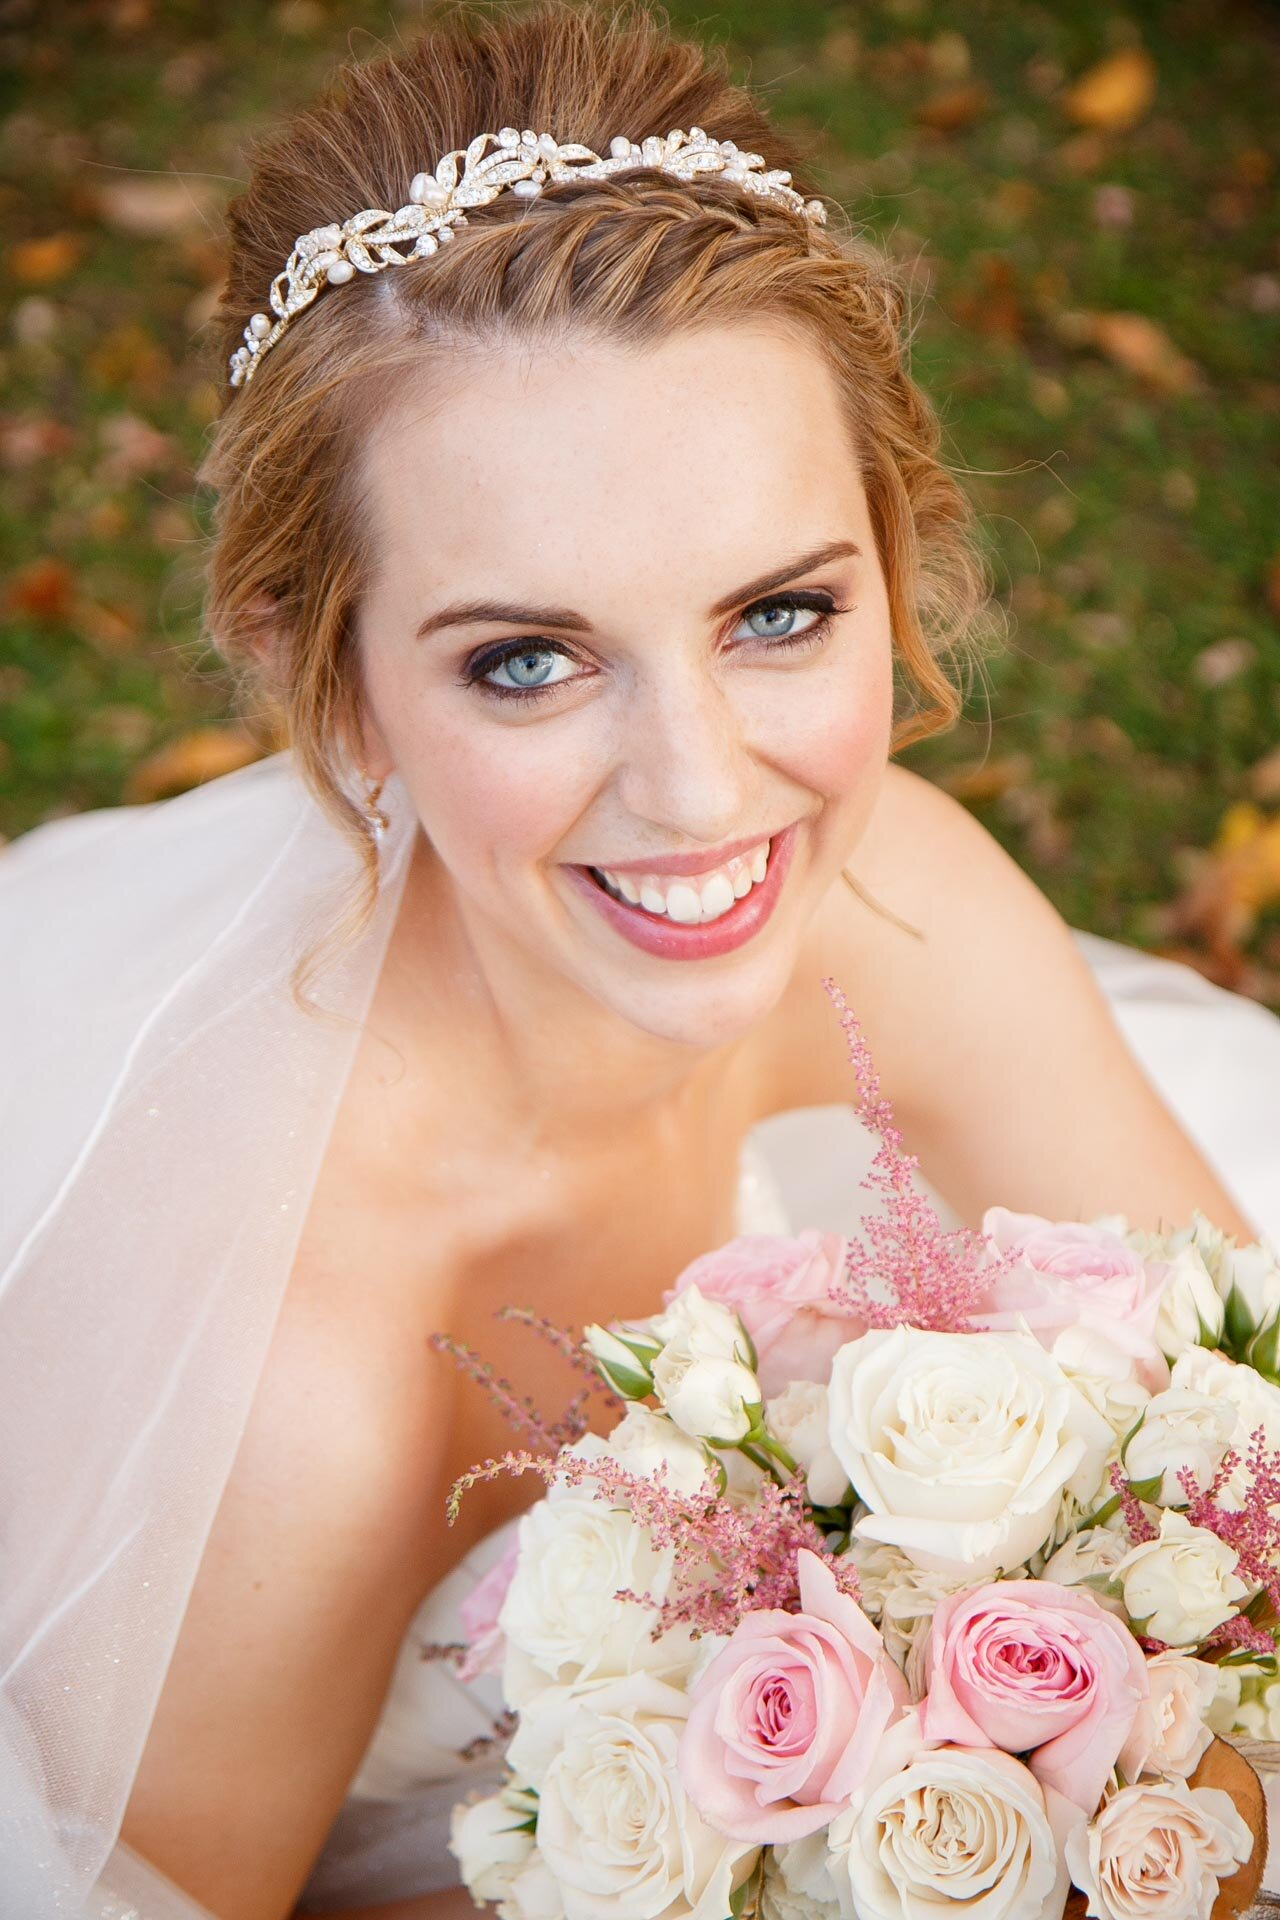 adam-shea-photography-fall-autumn-lighting-engagement-wedding-photos-adam-shea-photography-green-bay-appleton-neenah-photographer-08.jpg